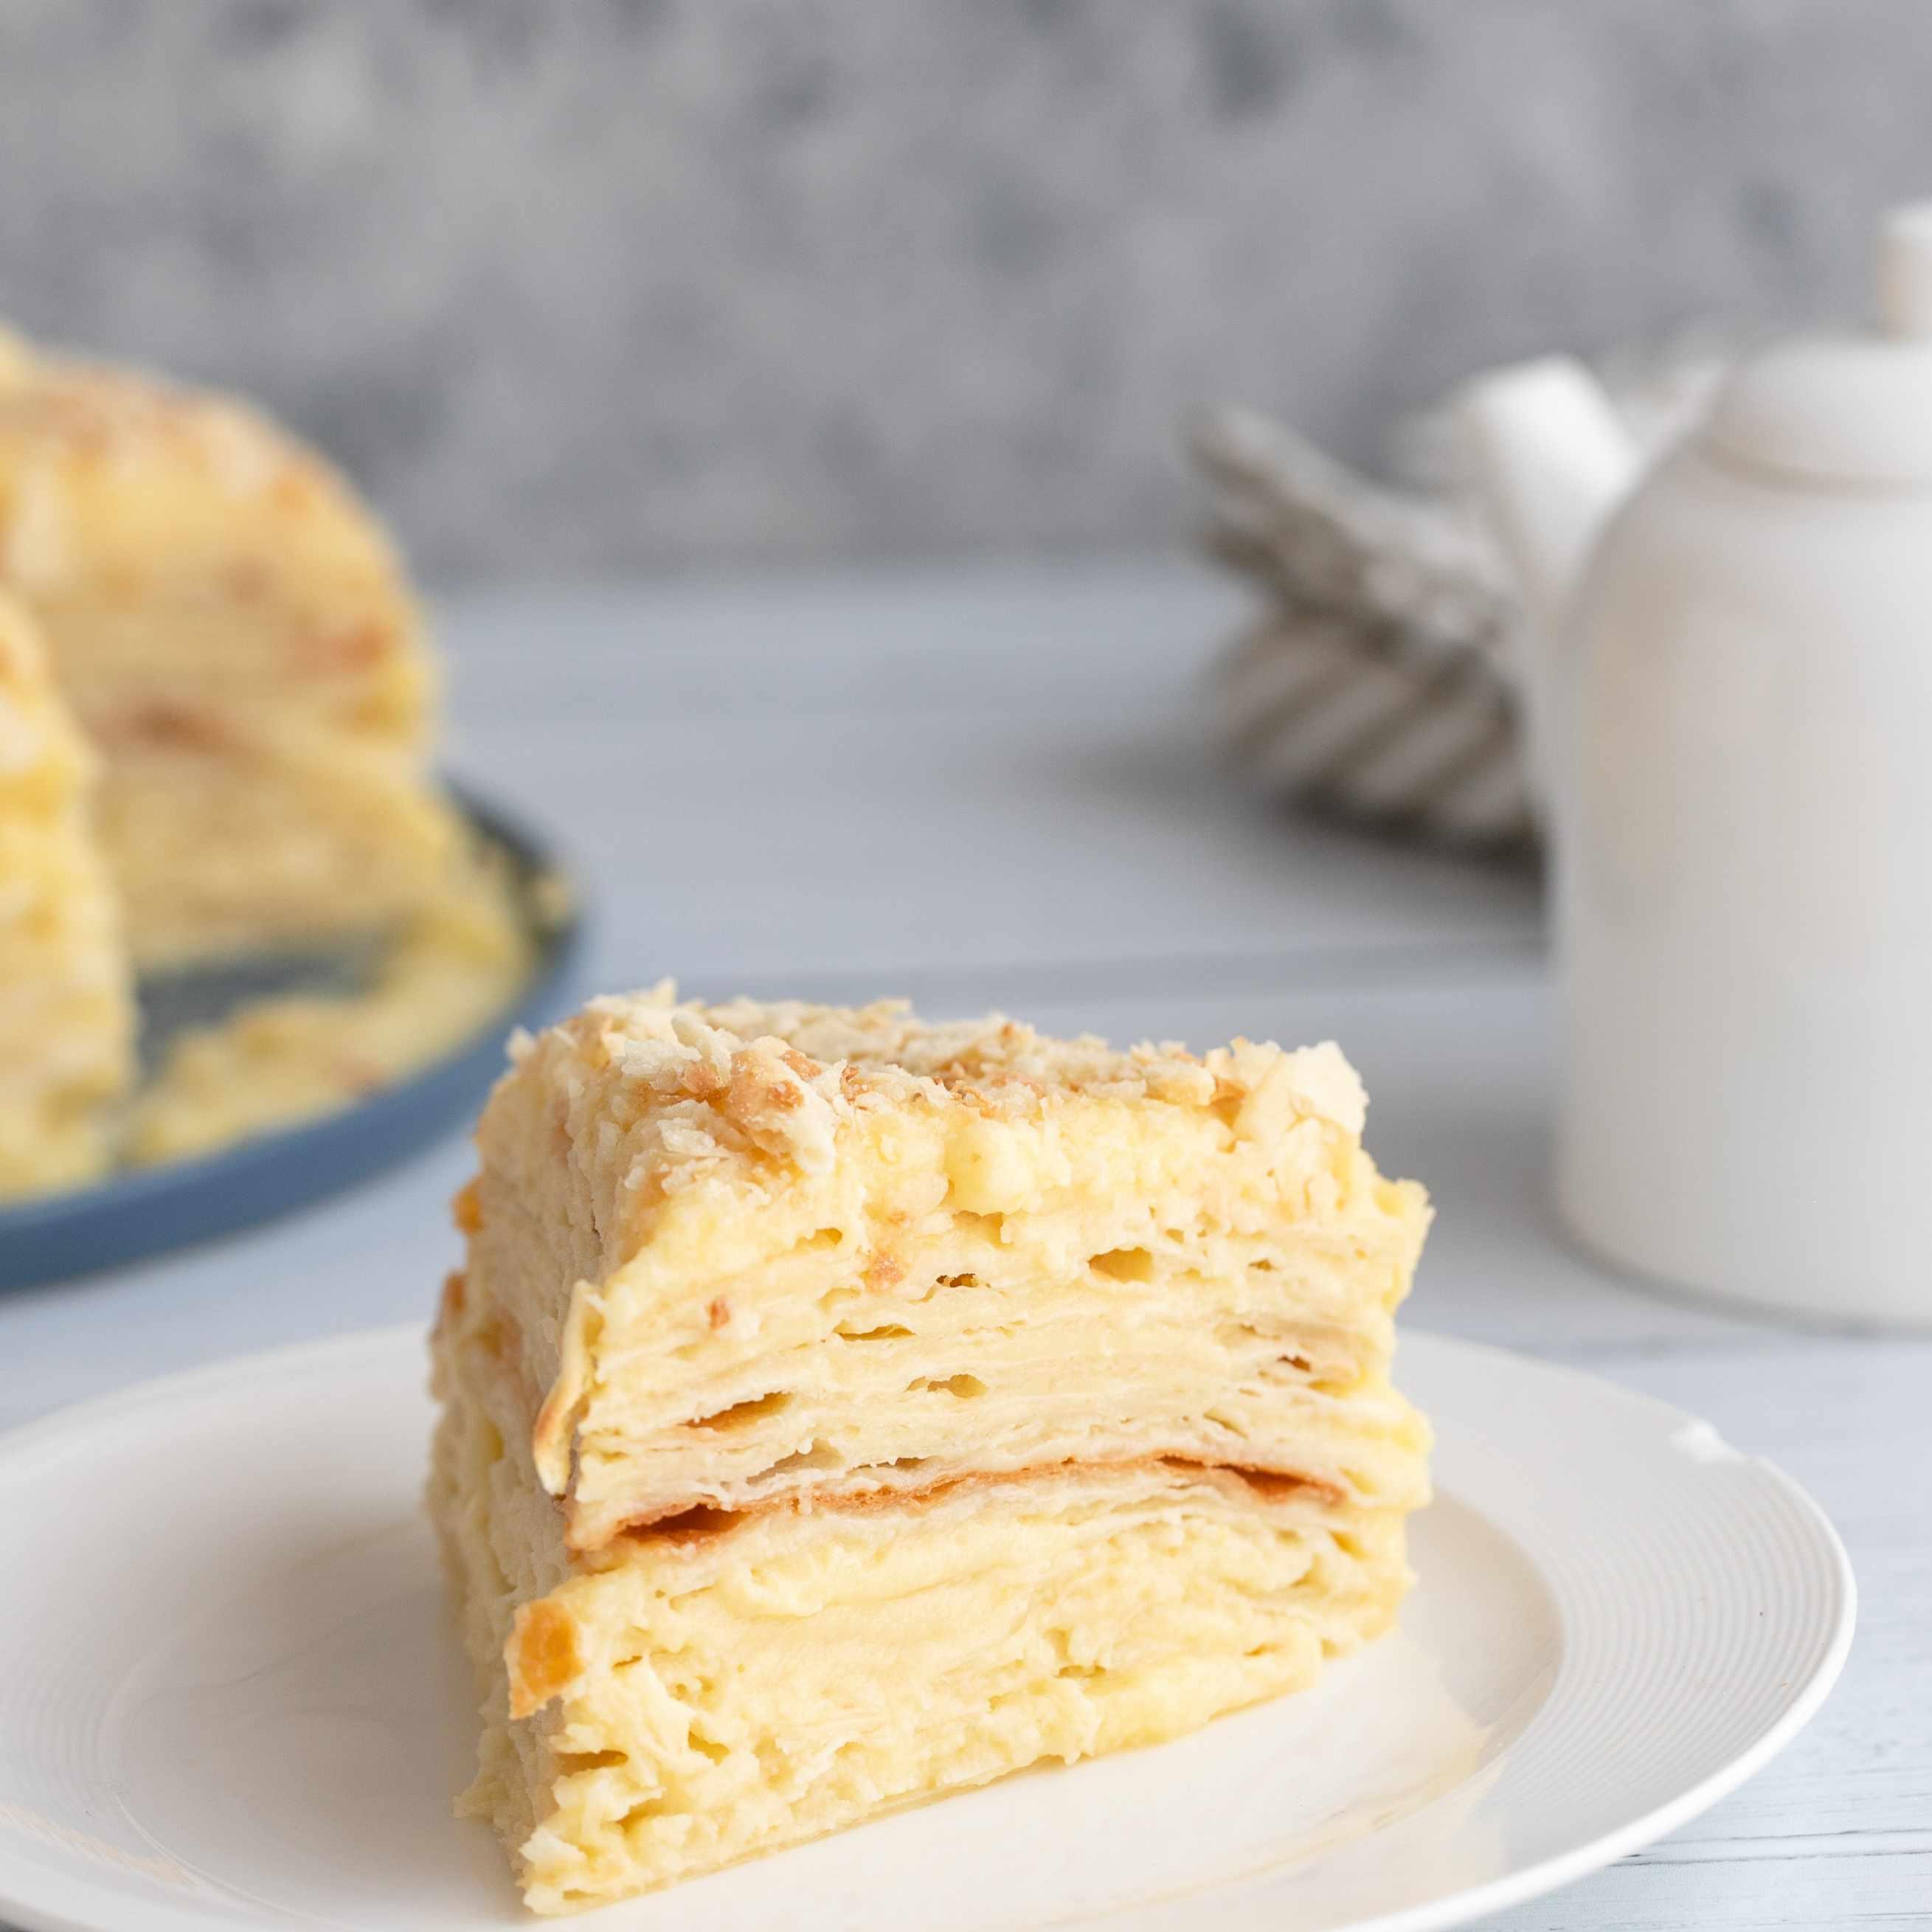 Cake slice on a plate